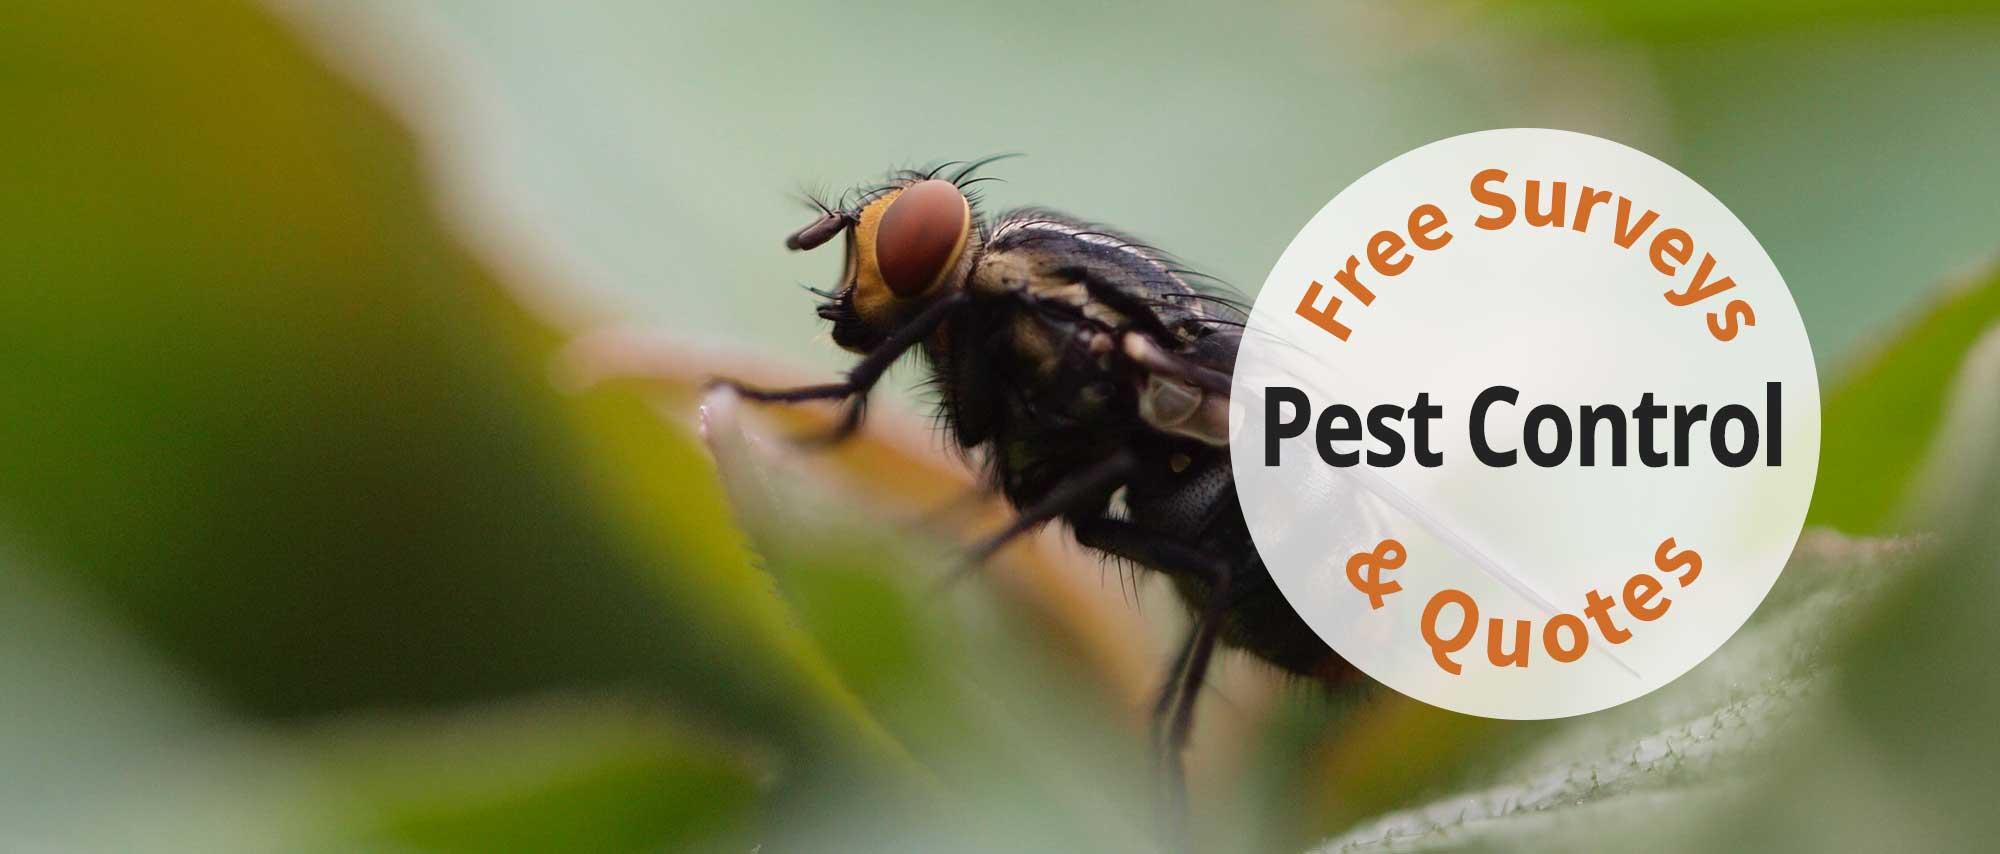 Sweetmeadow Pest Control